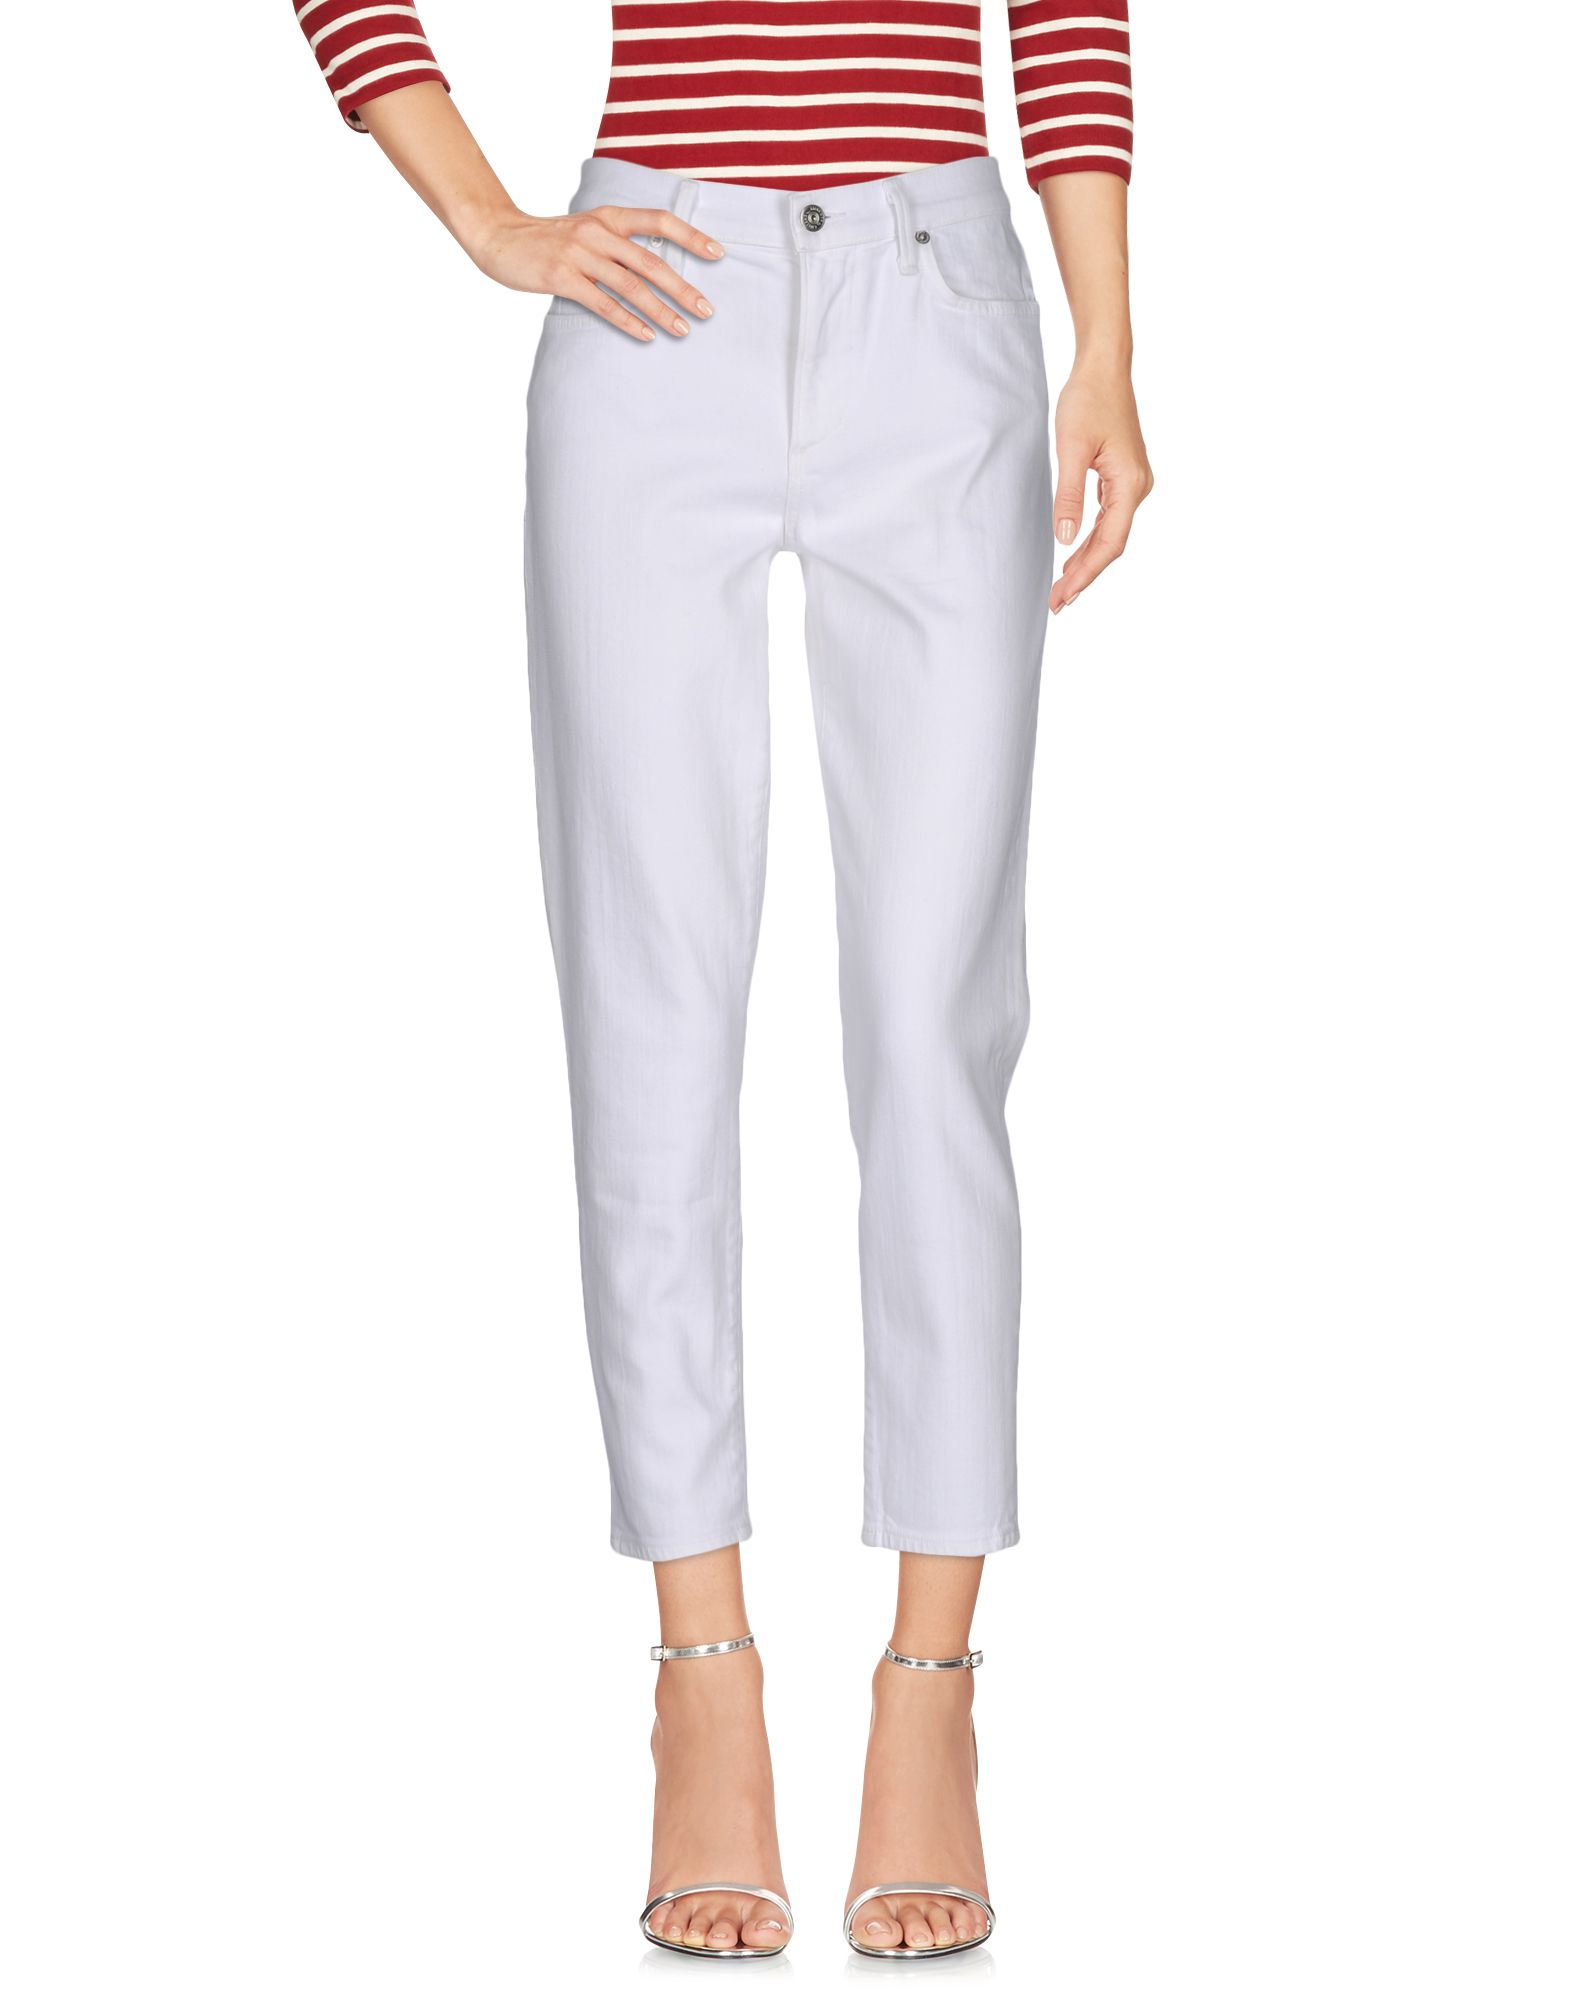 Pantaloni Jeans Citizens Of Humanity Donna - Acquista online su Bna2HejiME